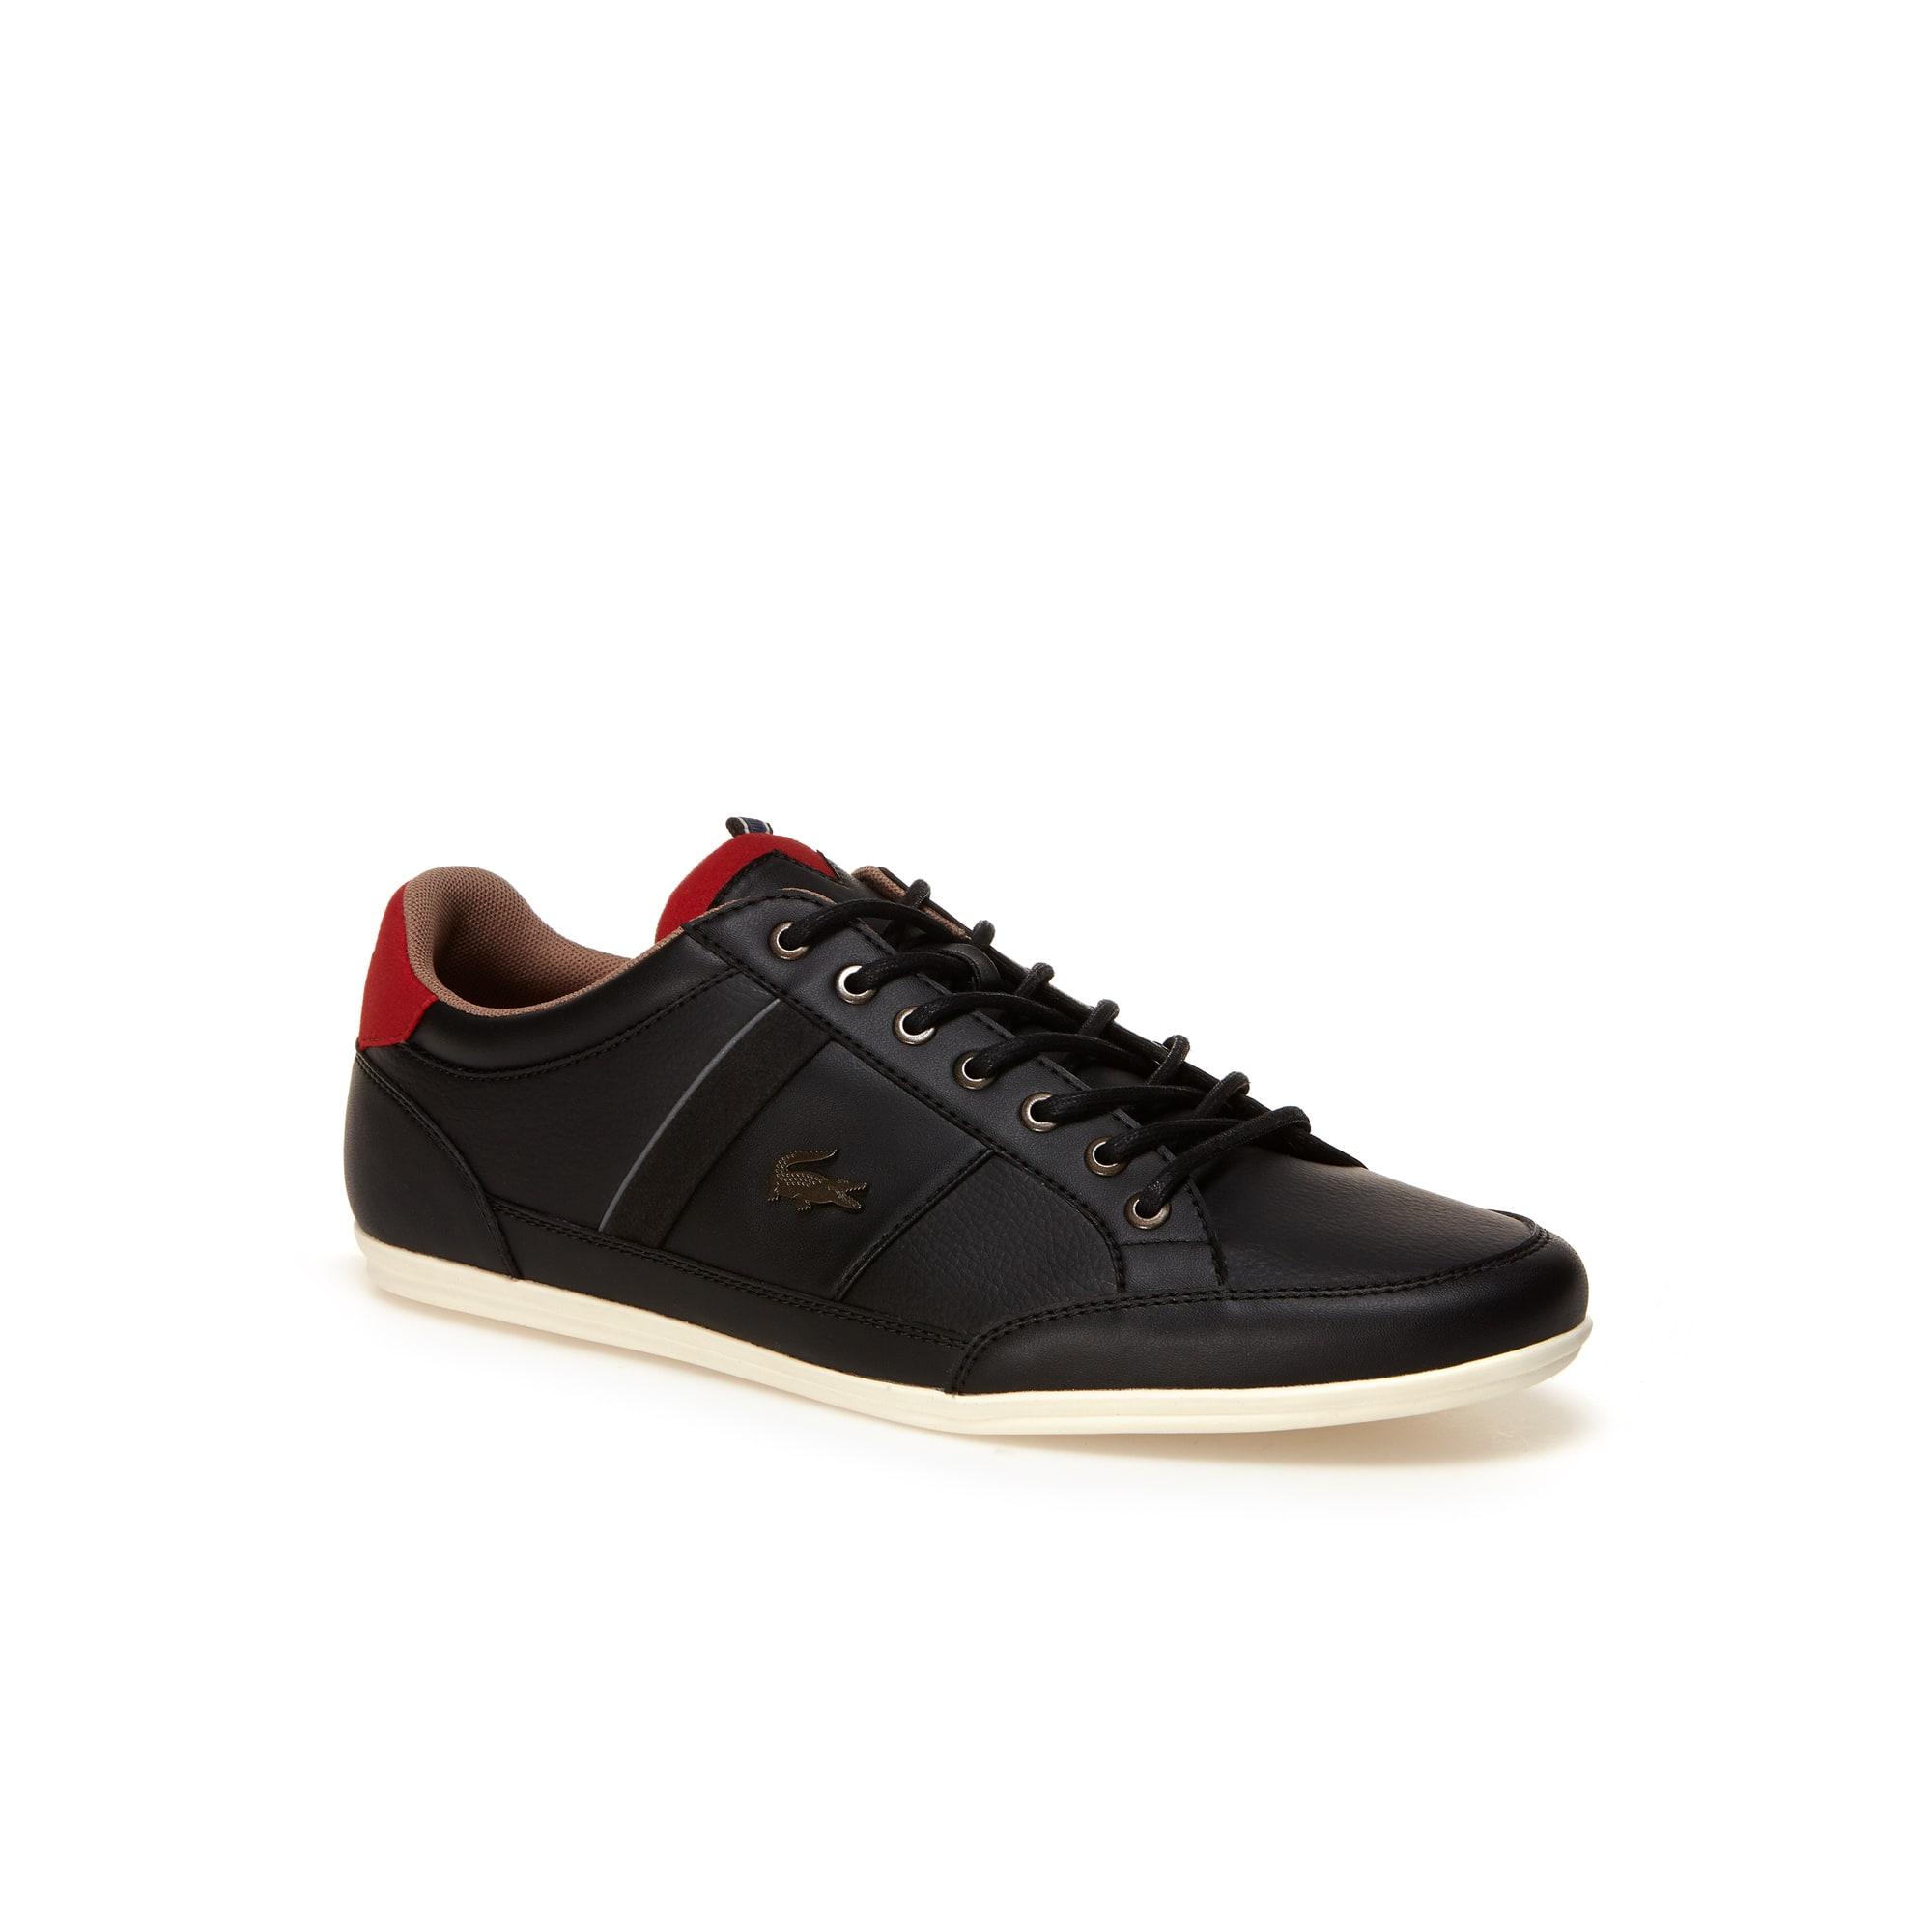 Herren-Sneakers CHAYMON aus Nappaleder